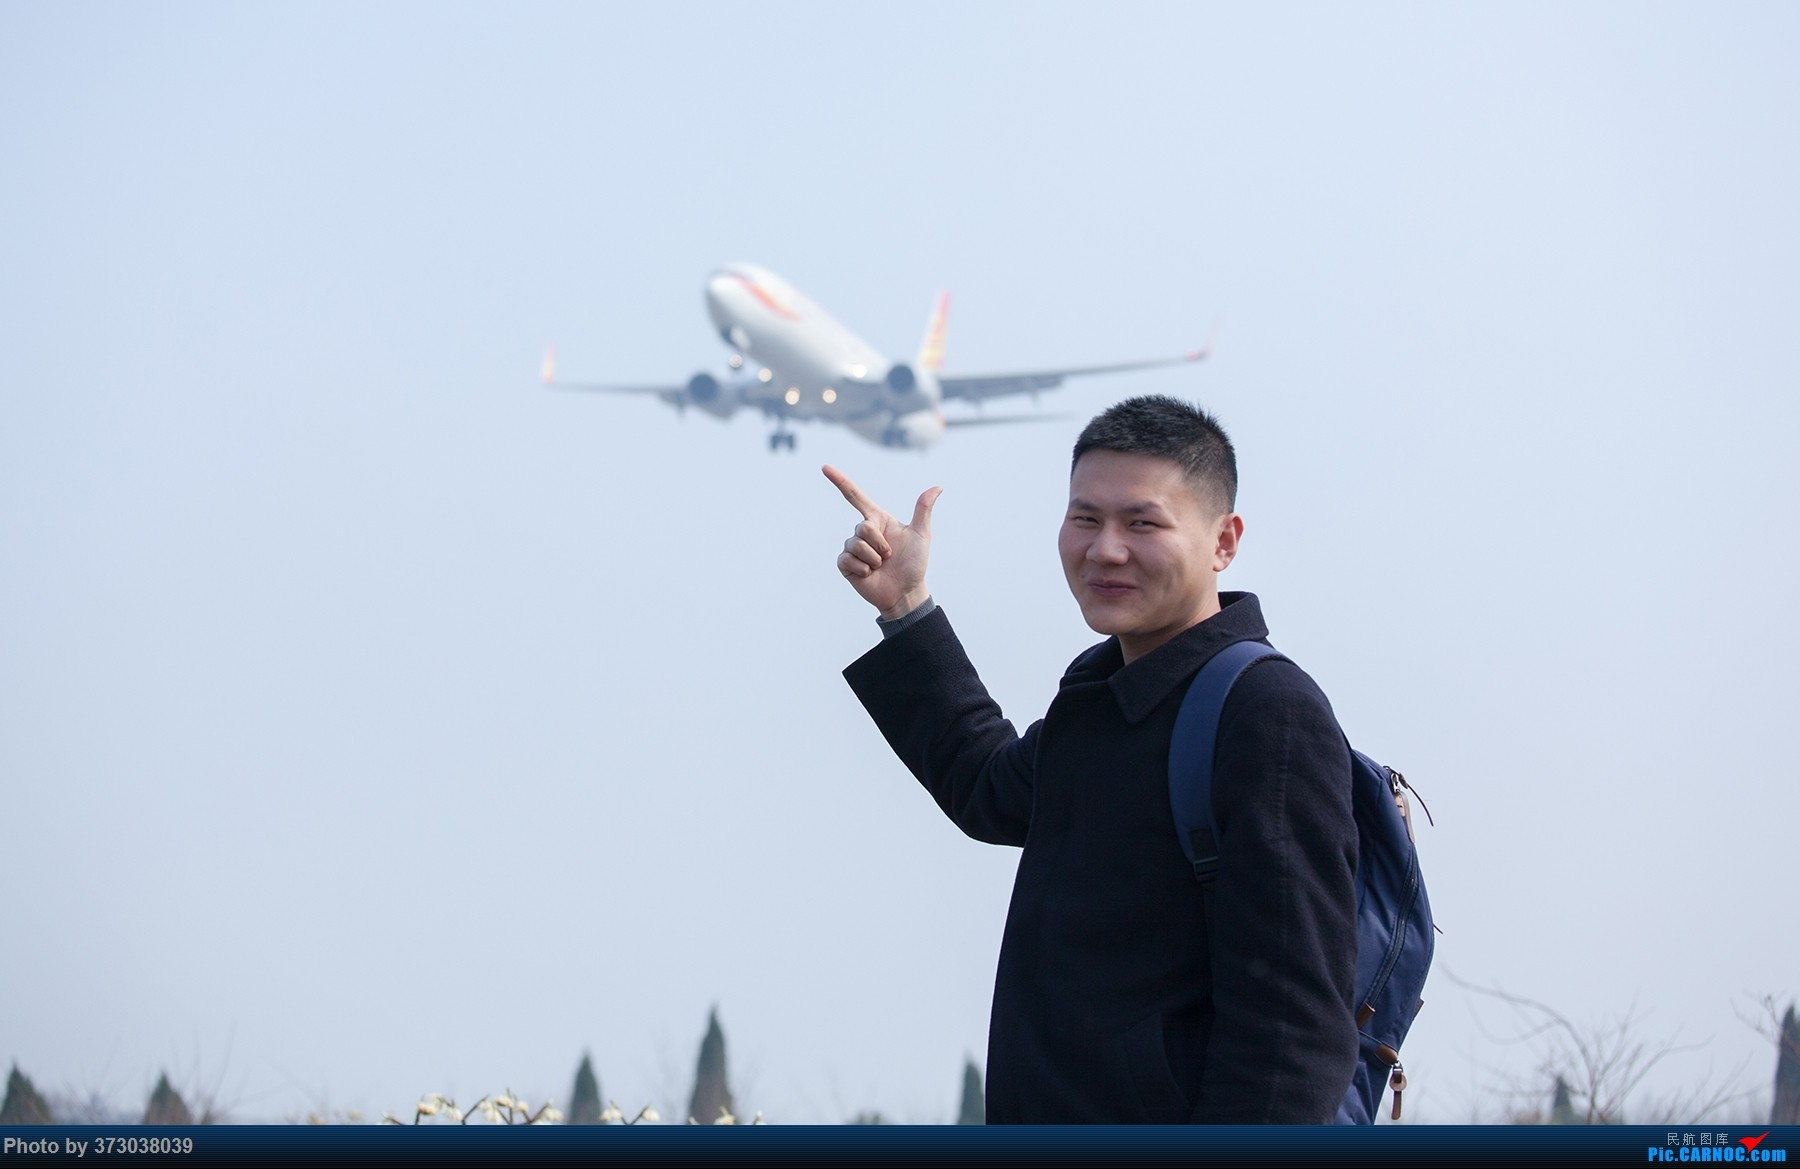 Re:[原创]【杭州飞友会】A320Neo迪士尼杭州萧山机场拍机班门弄斧记 BOEING 737-800 B-5083 中国杭州萧山国际机场  飞友